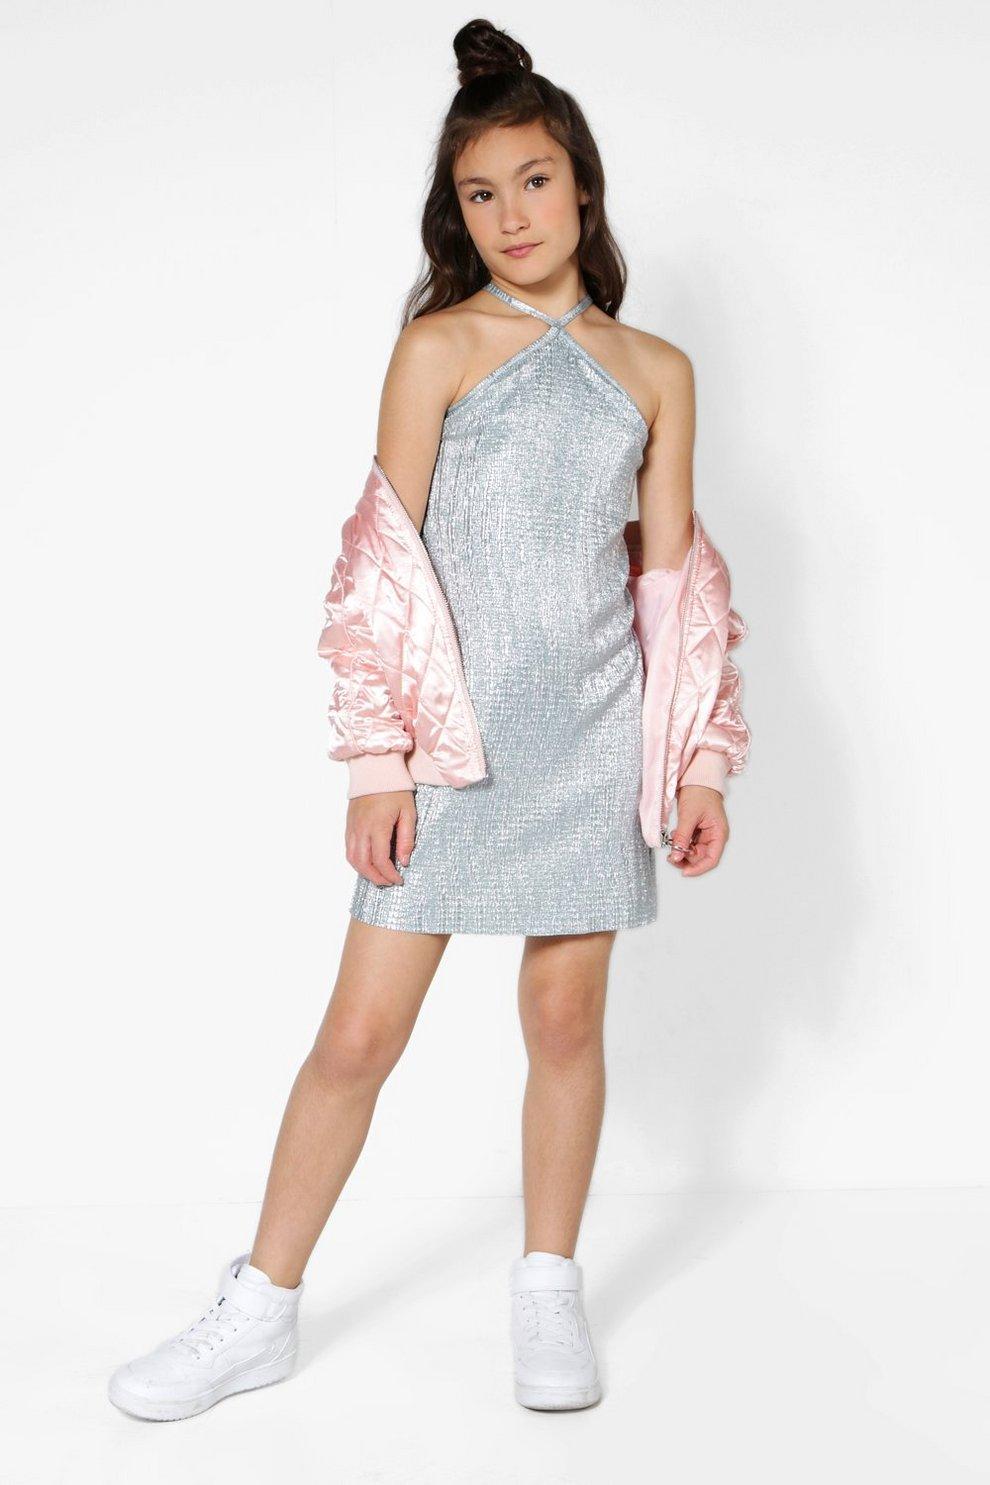 Girls Mini Dress Model